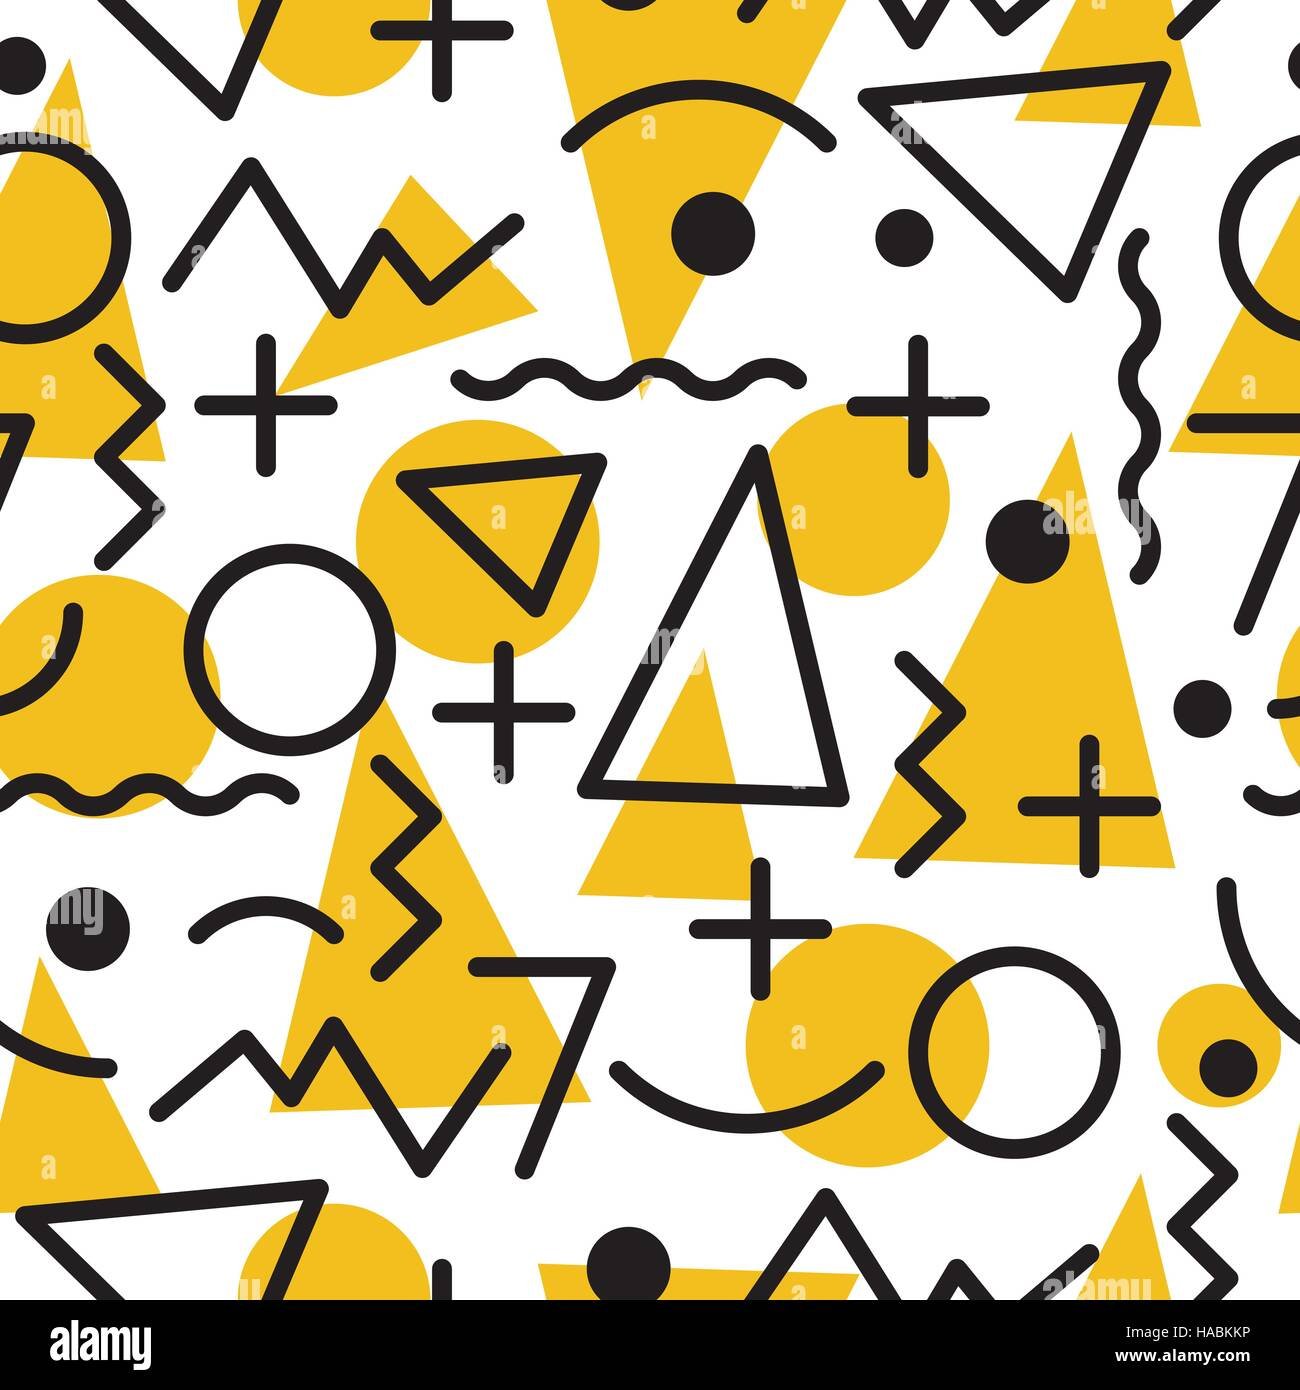 geometric minimal seamless abstract pattern - Stock Image